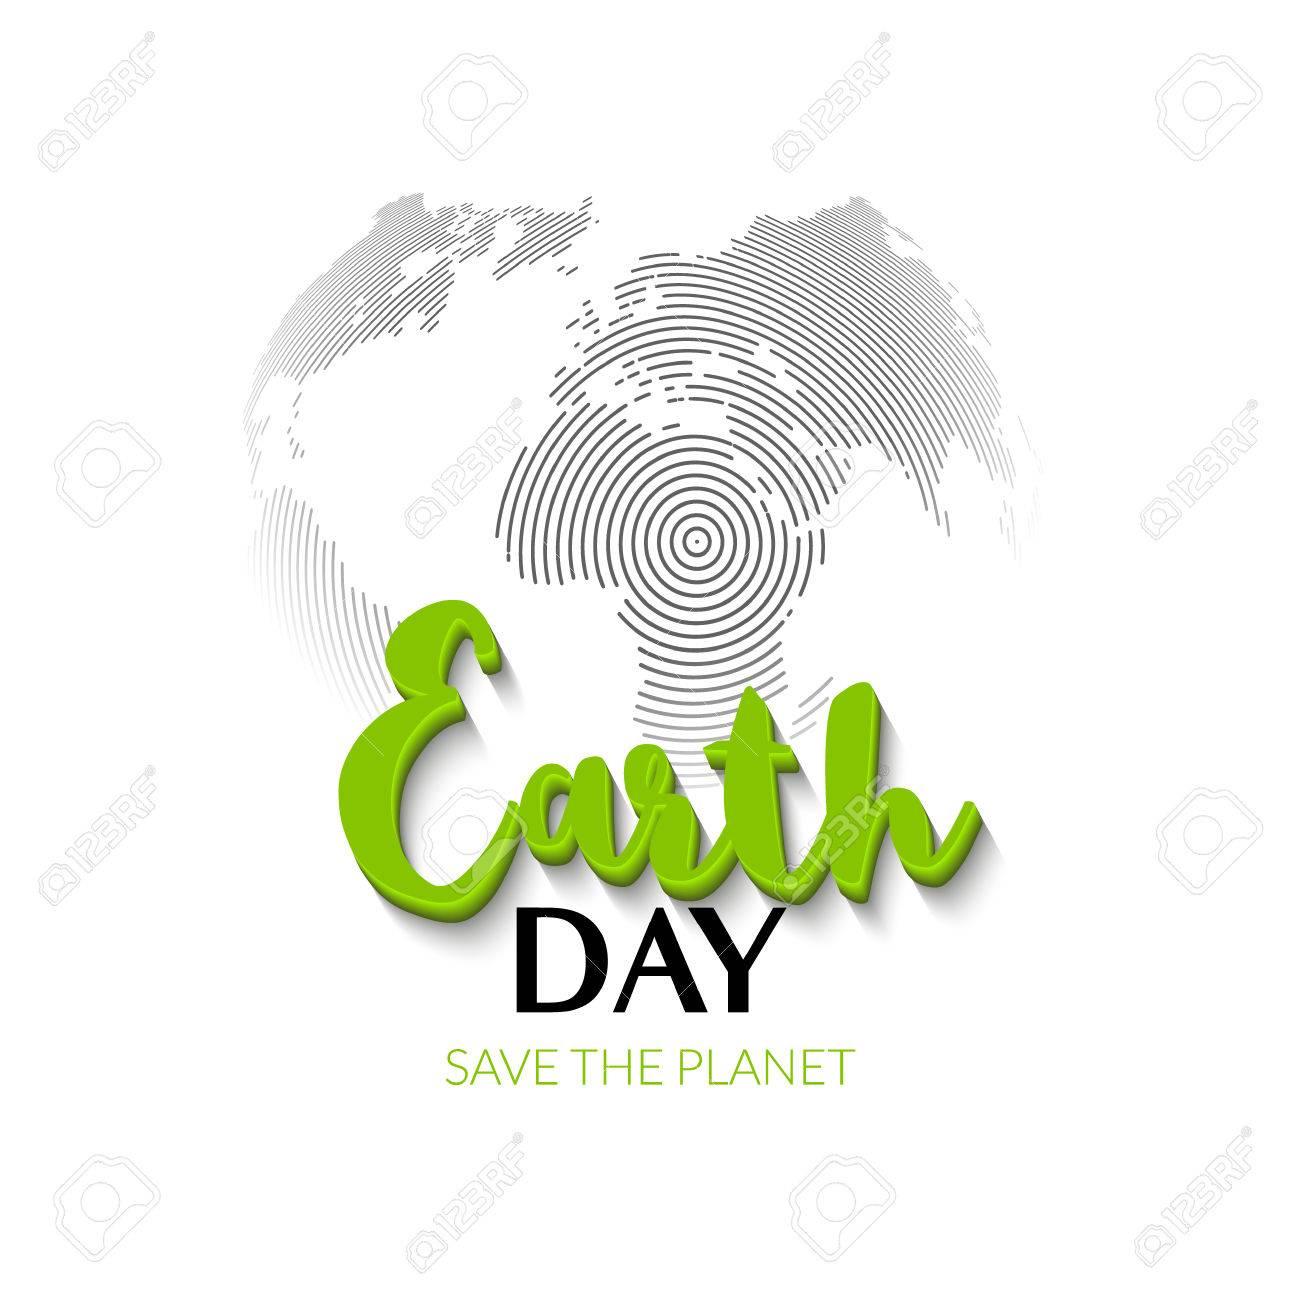 Earth day earth world map globe sign hand drawn lettering quote earth world map globe sign hand drawn lettering quote earth day gumiabroncs Choice Image